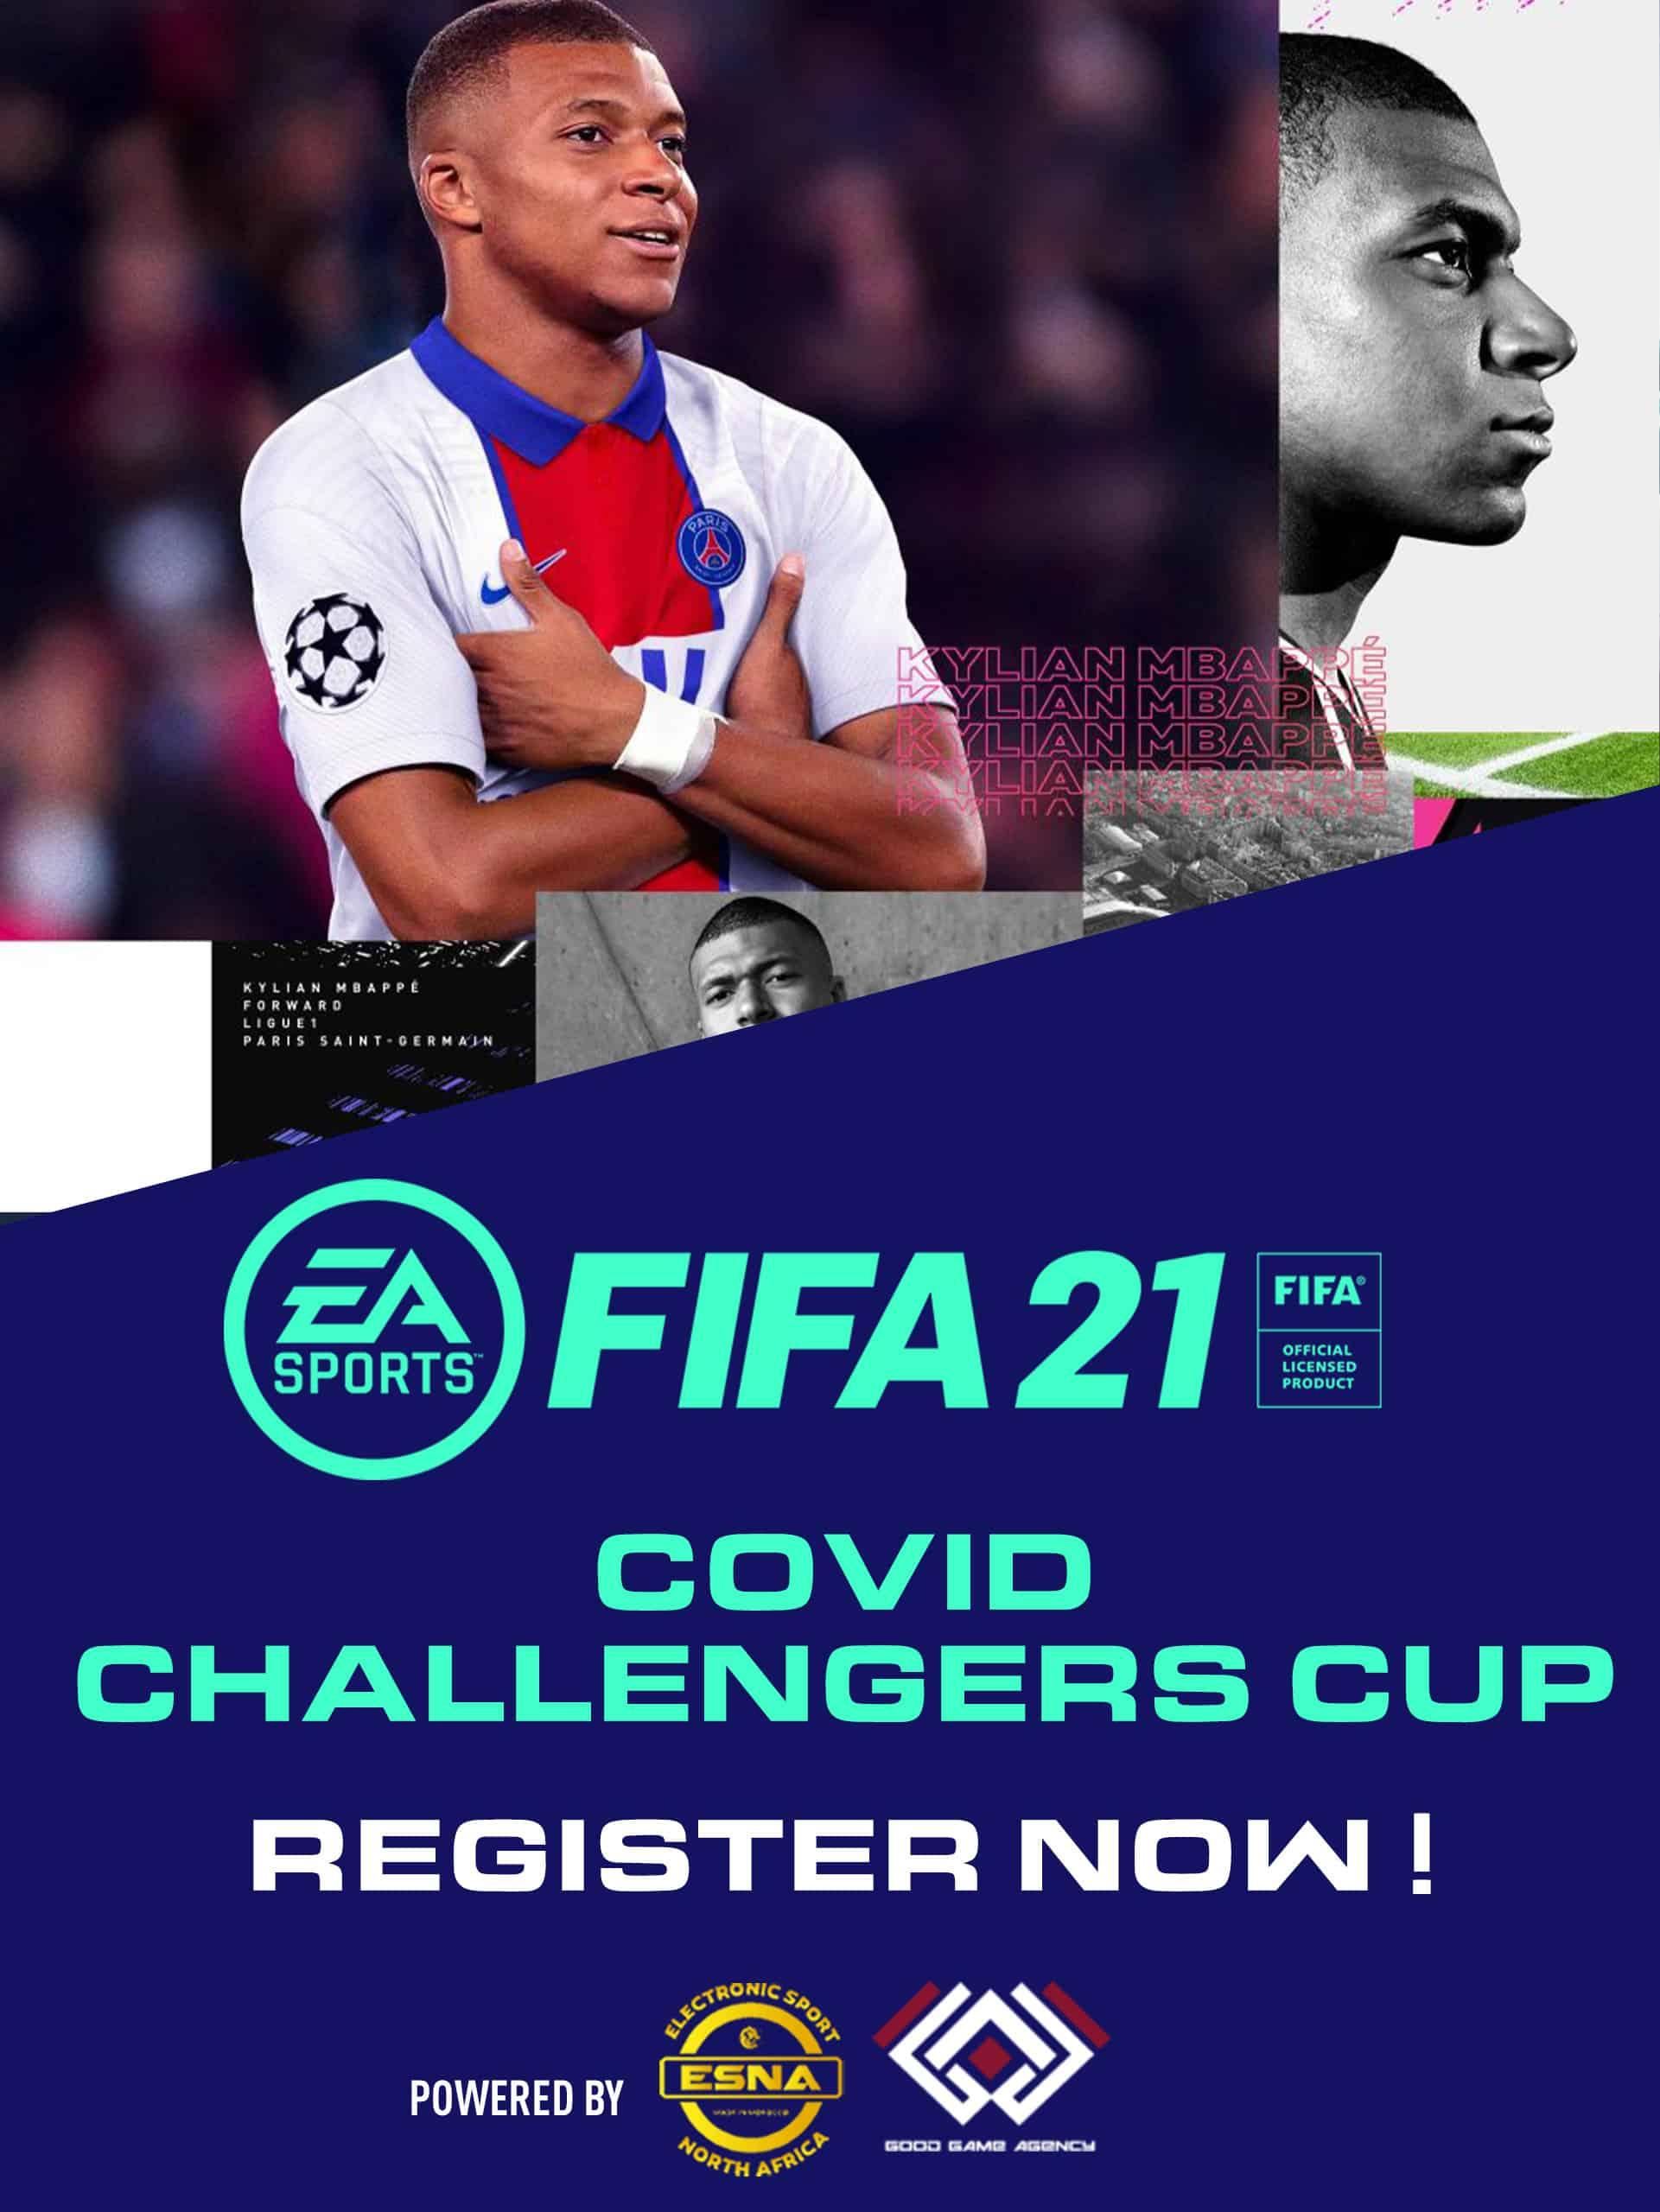 ESNA MOBILE FIFA 21